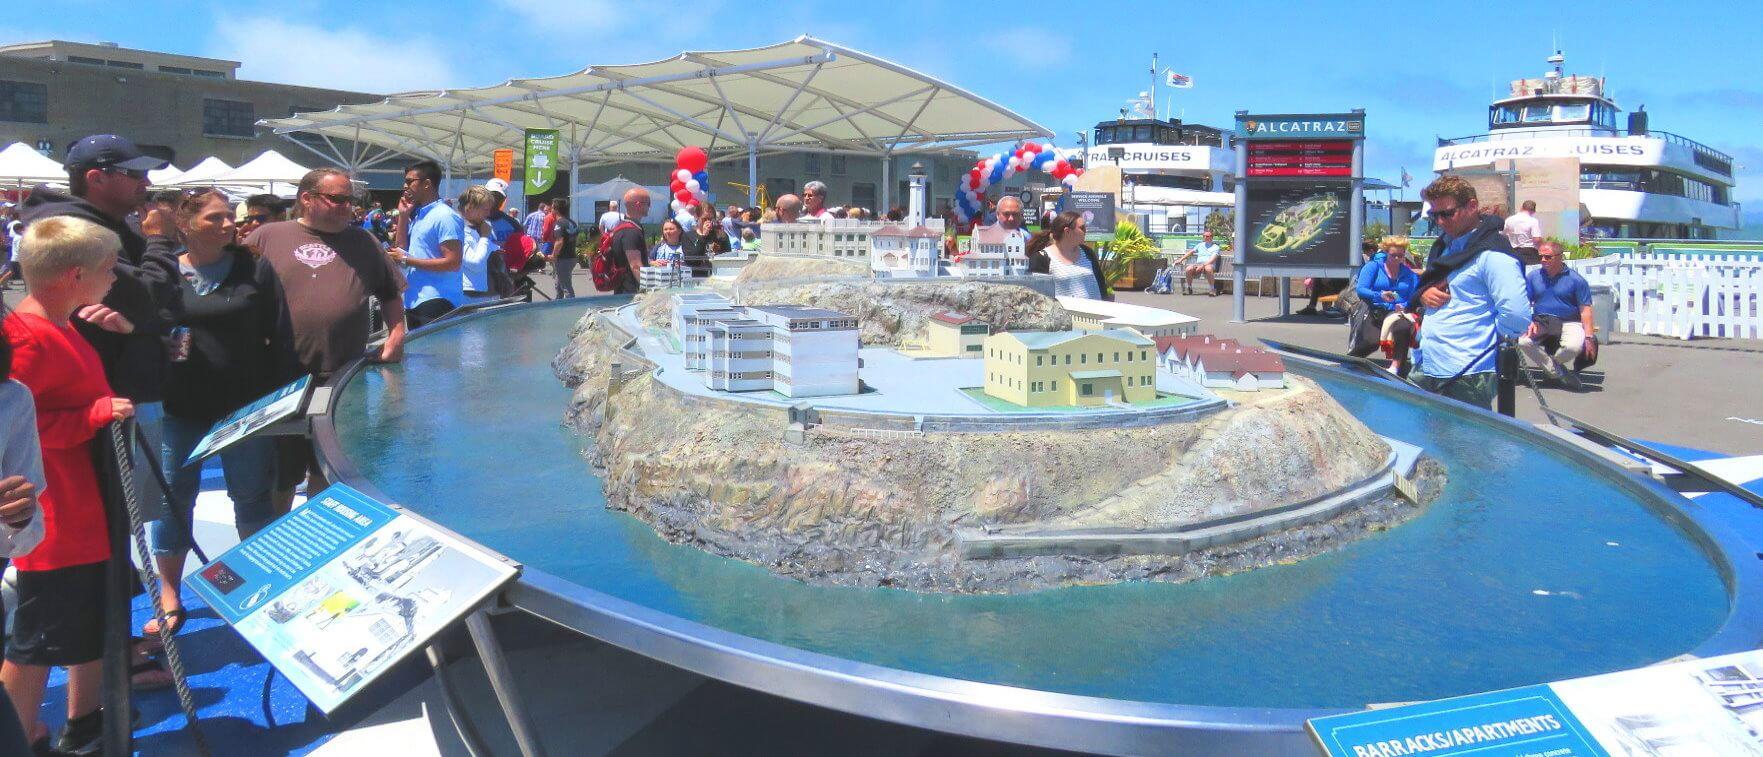 alcatraz_cruises_landing_area_ferry_terminal_pier_33_ticket_booth_tickets